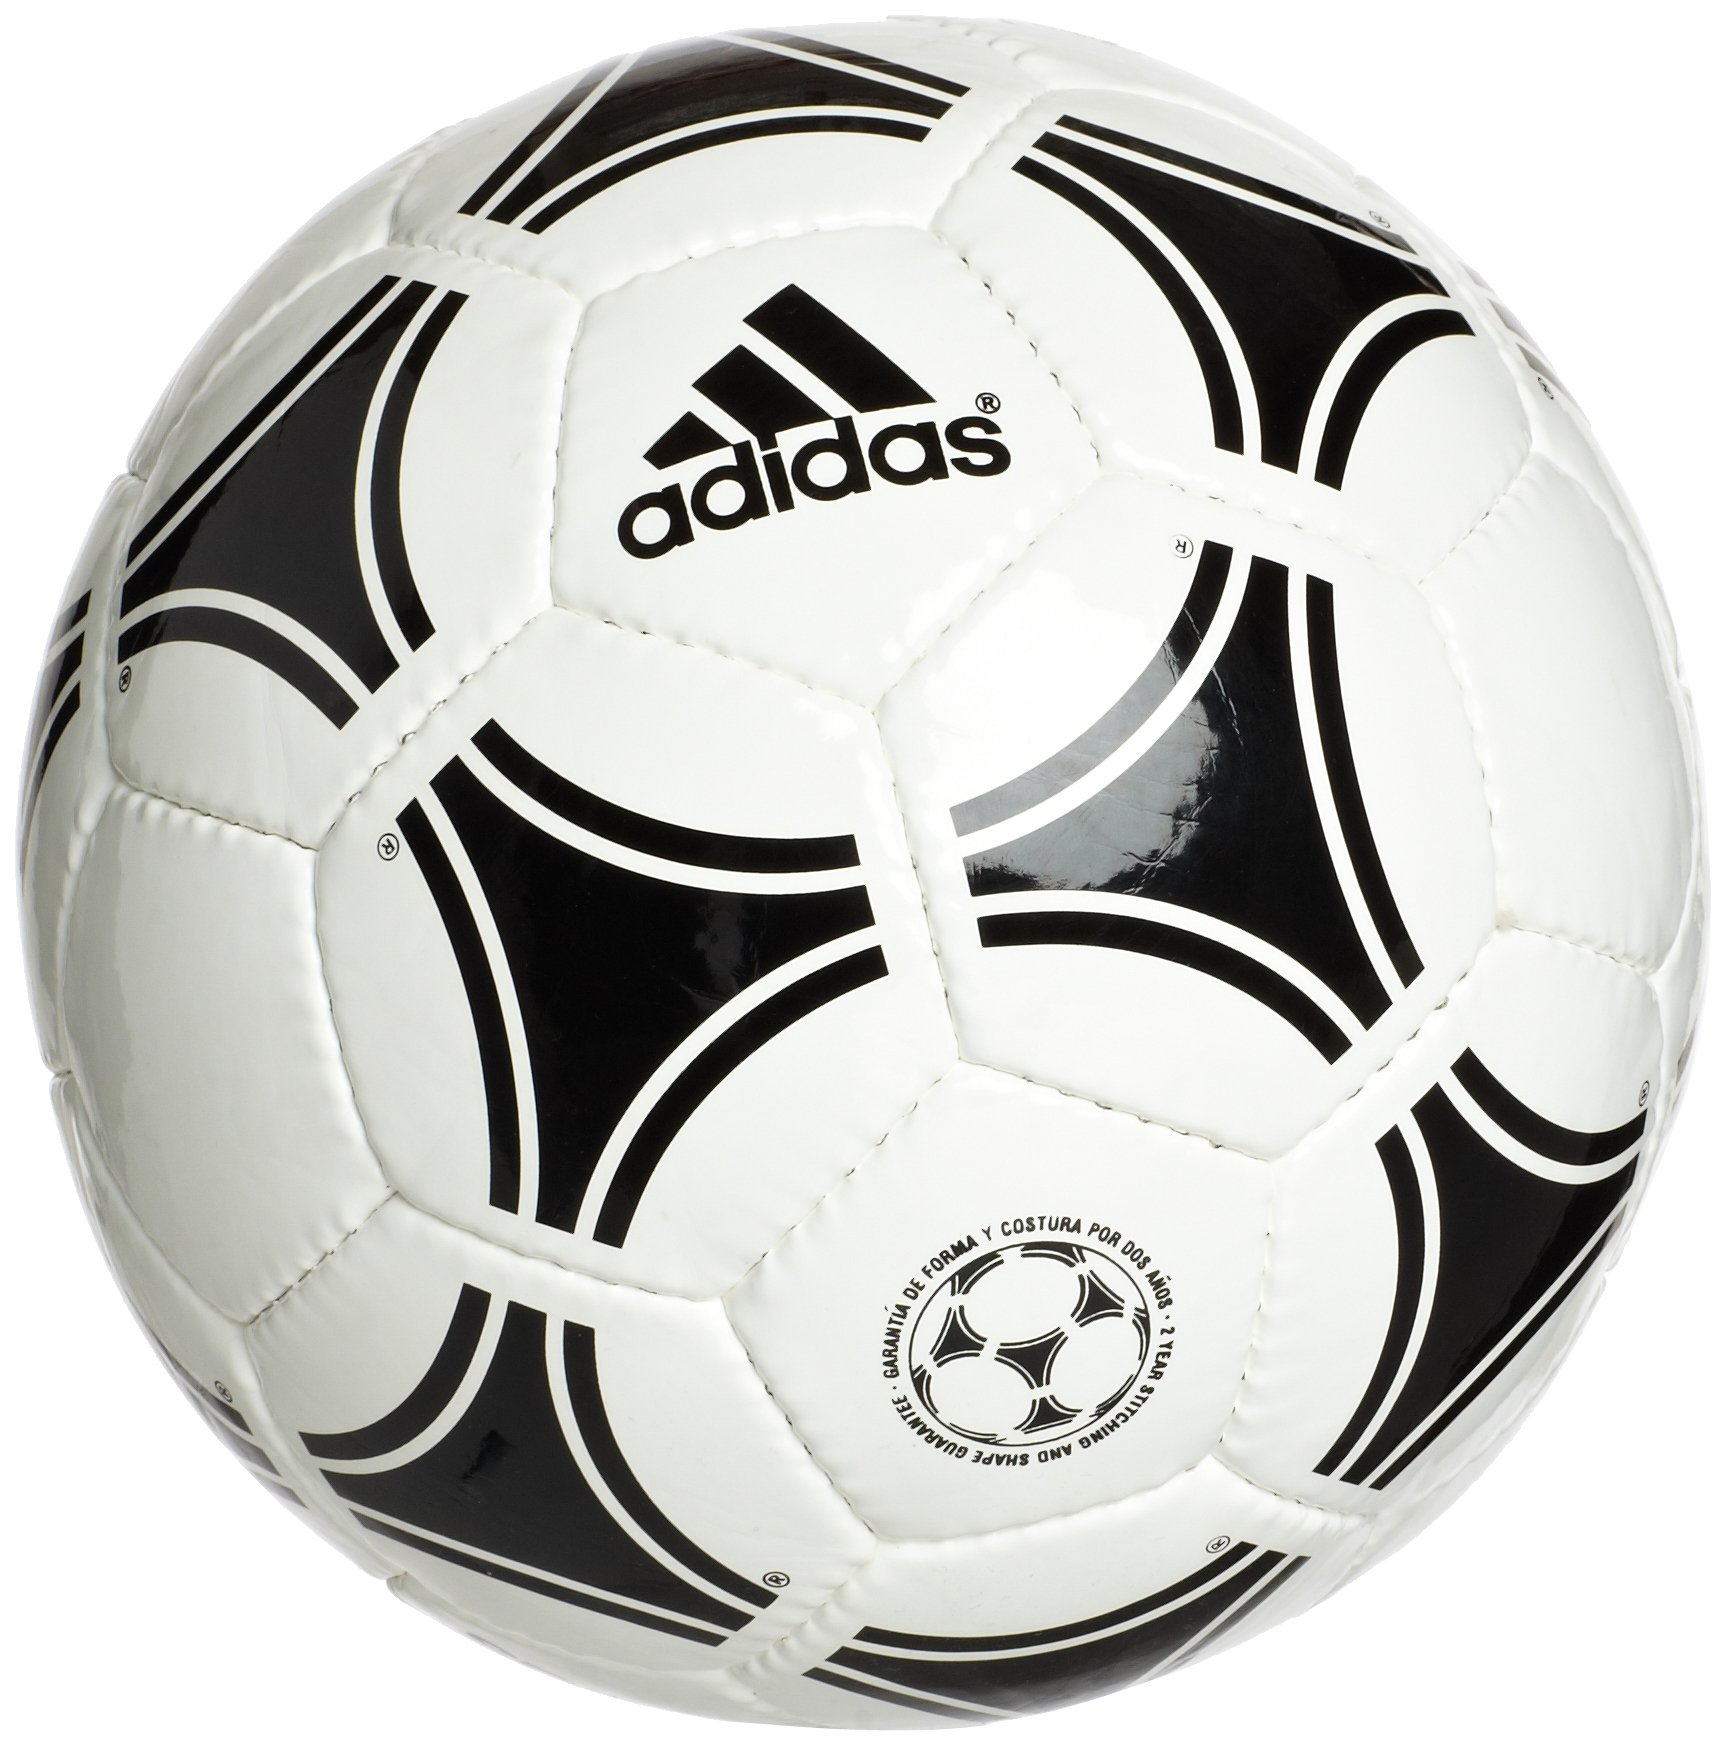 Adidas Pallone Tango Rosario ND, Bianco/Nero